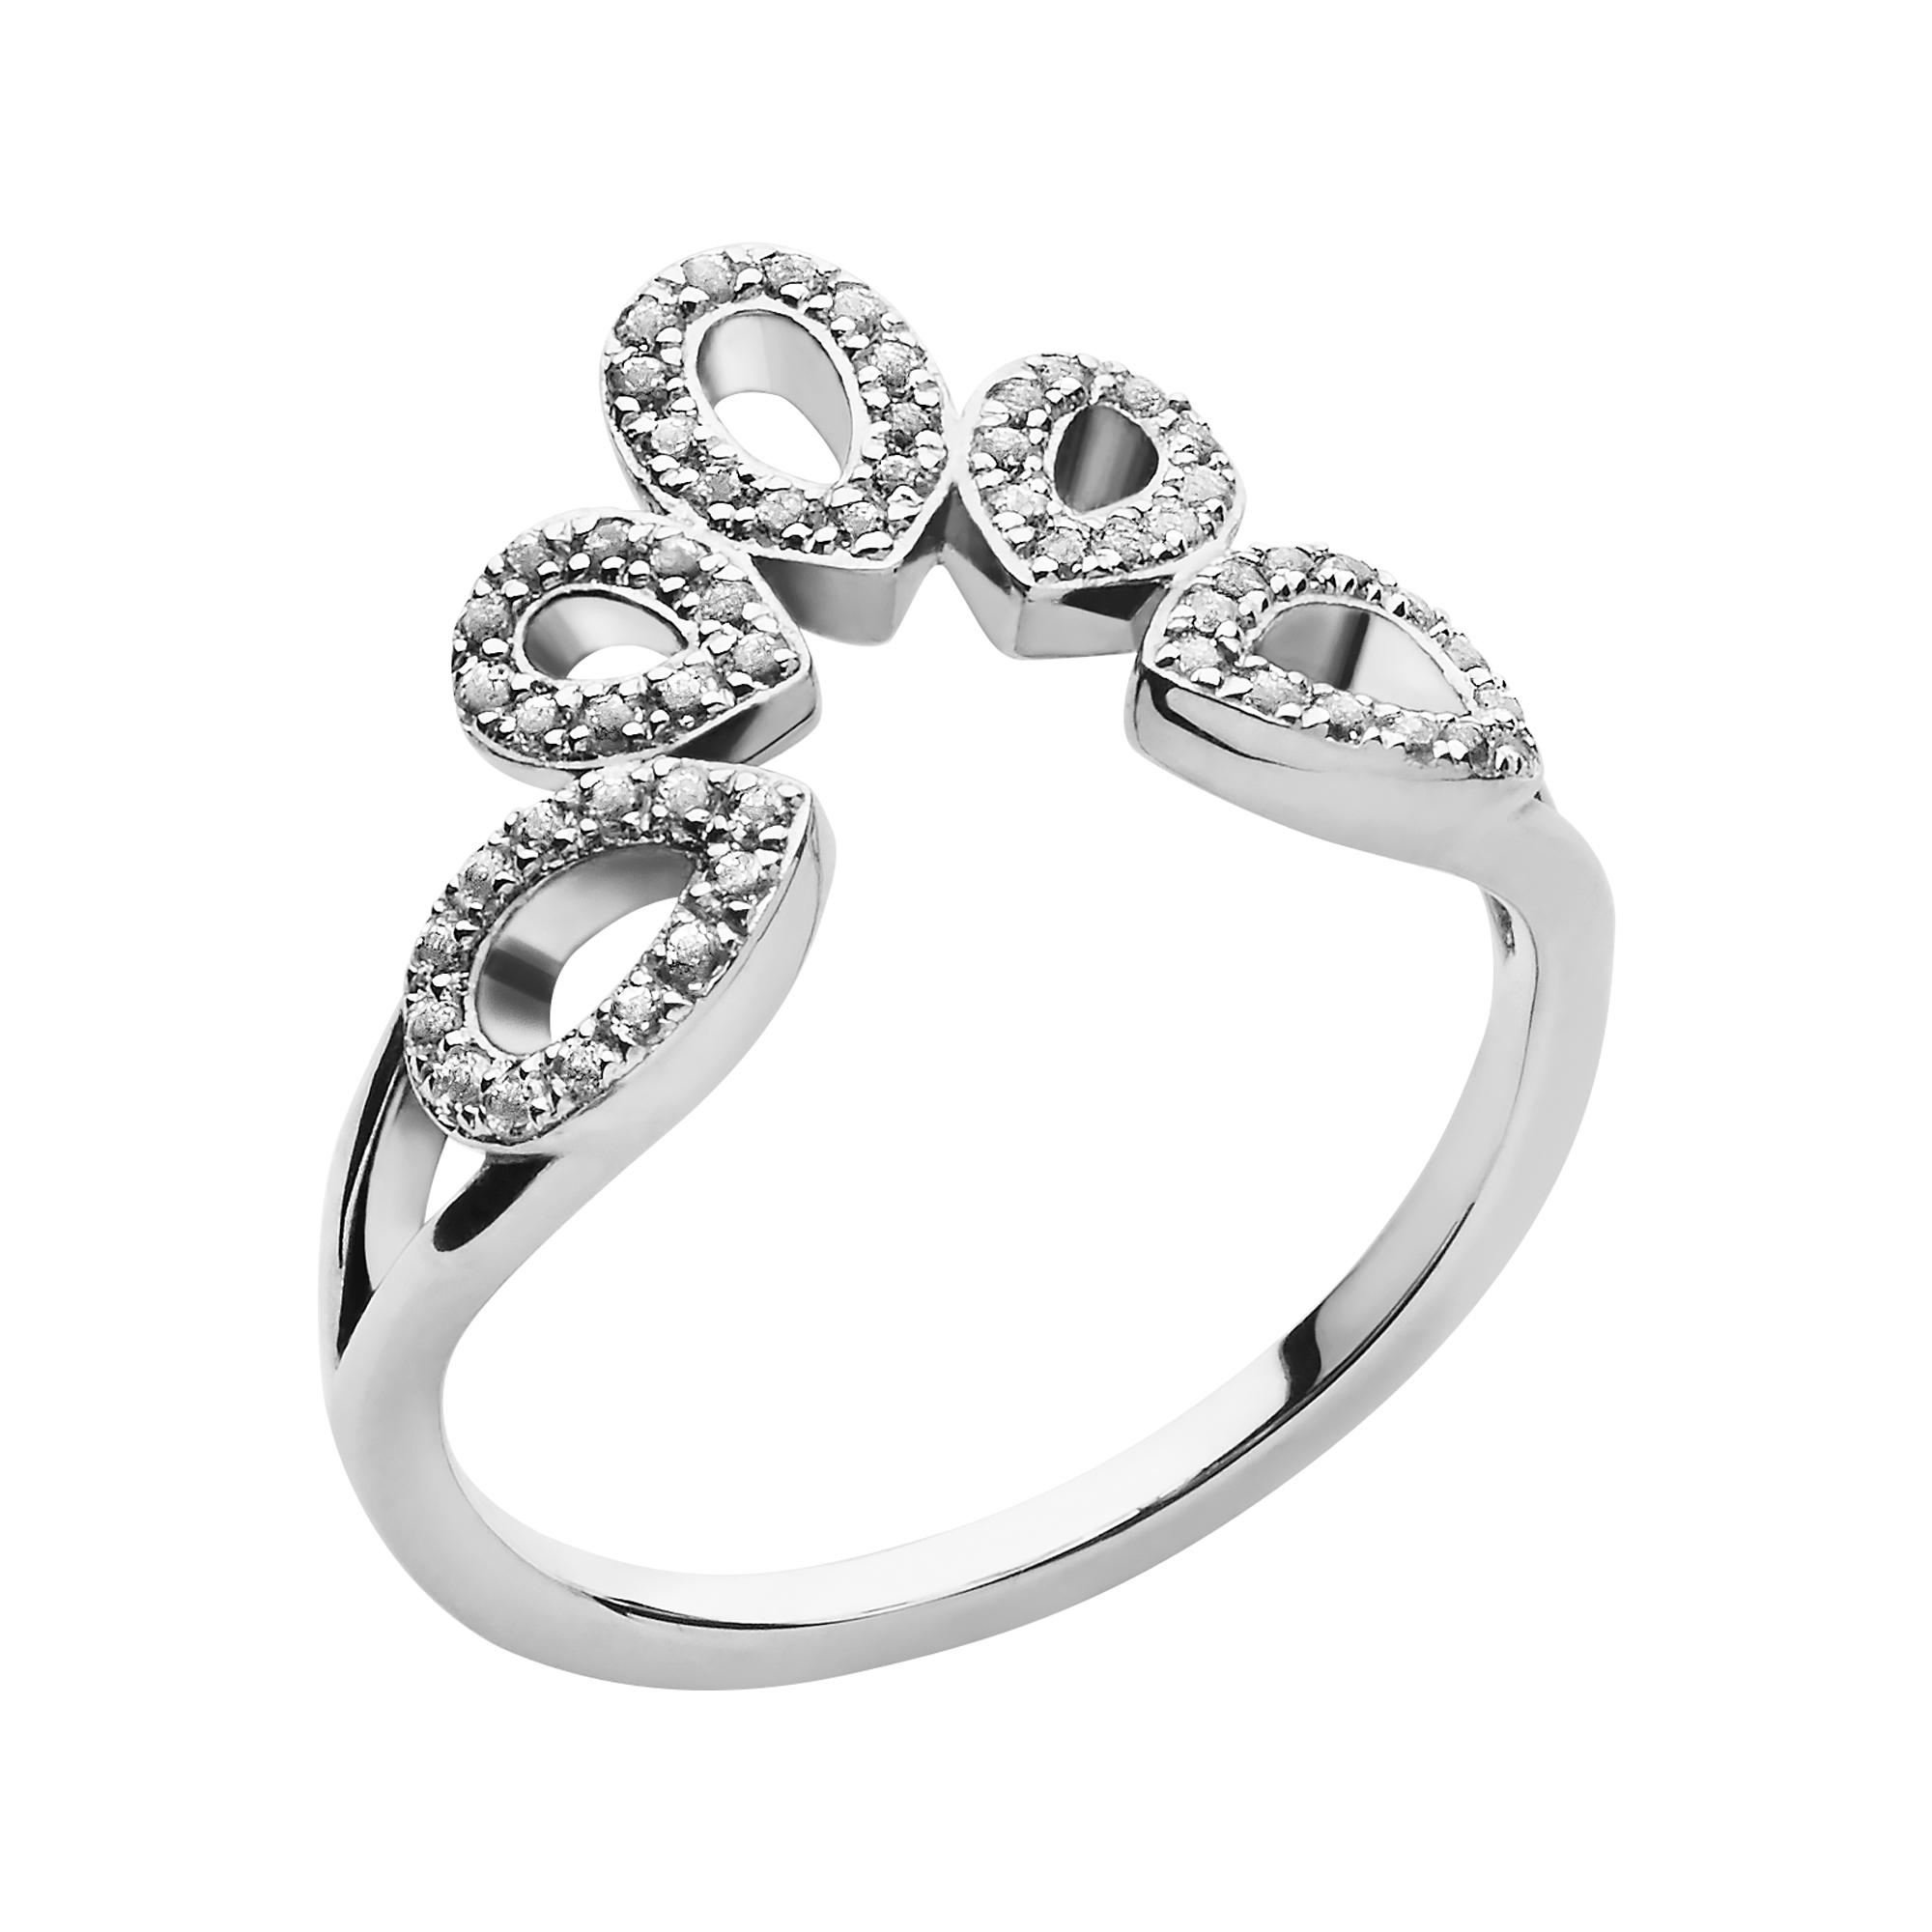 LINKS OF LONDON - Ασημένιο δαχτυλίδι Peardrops -μέγεθος 53